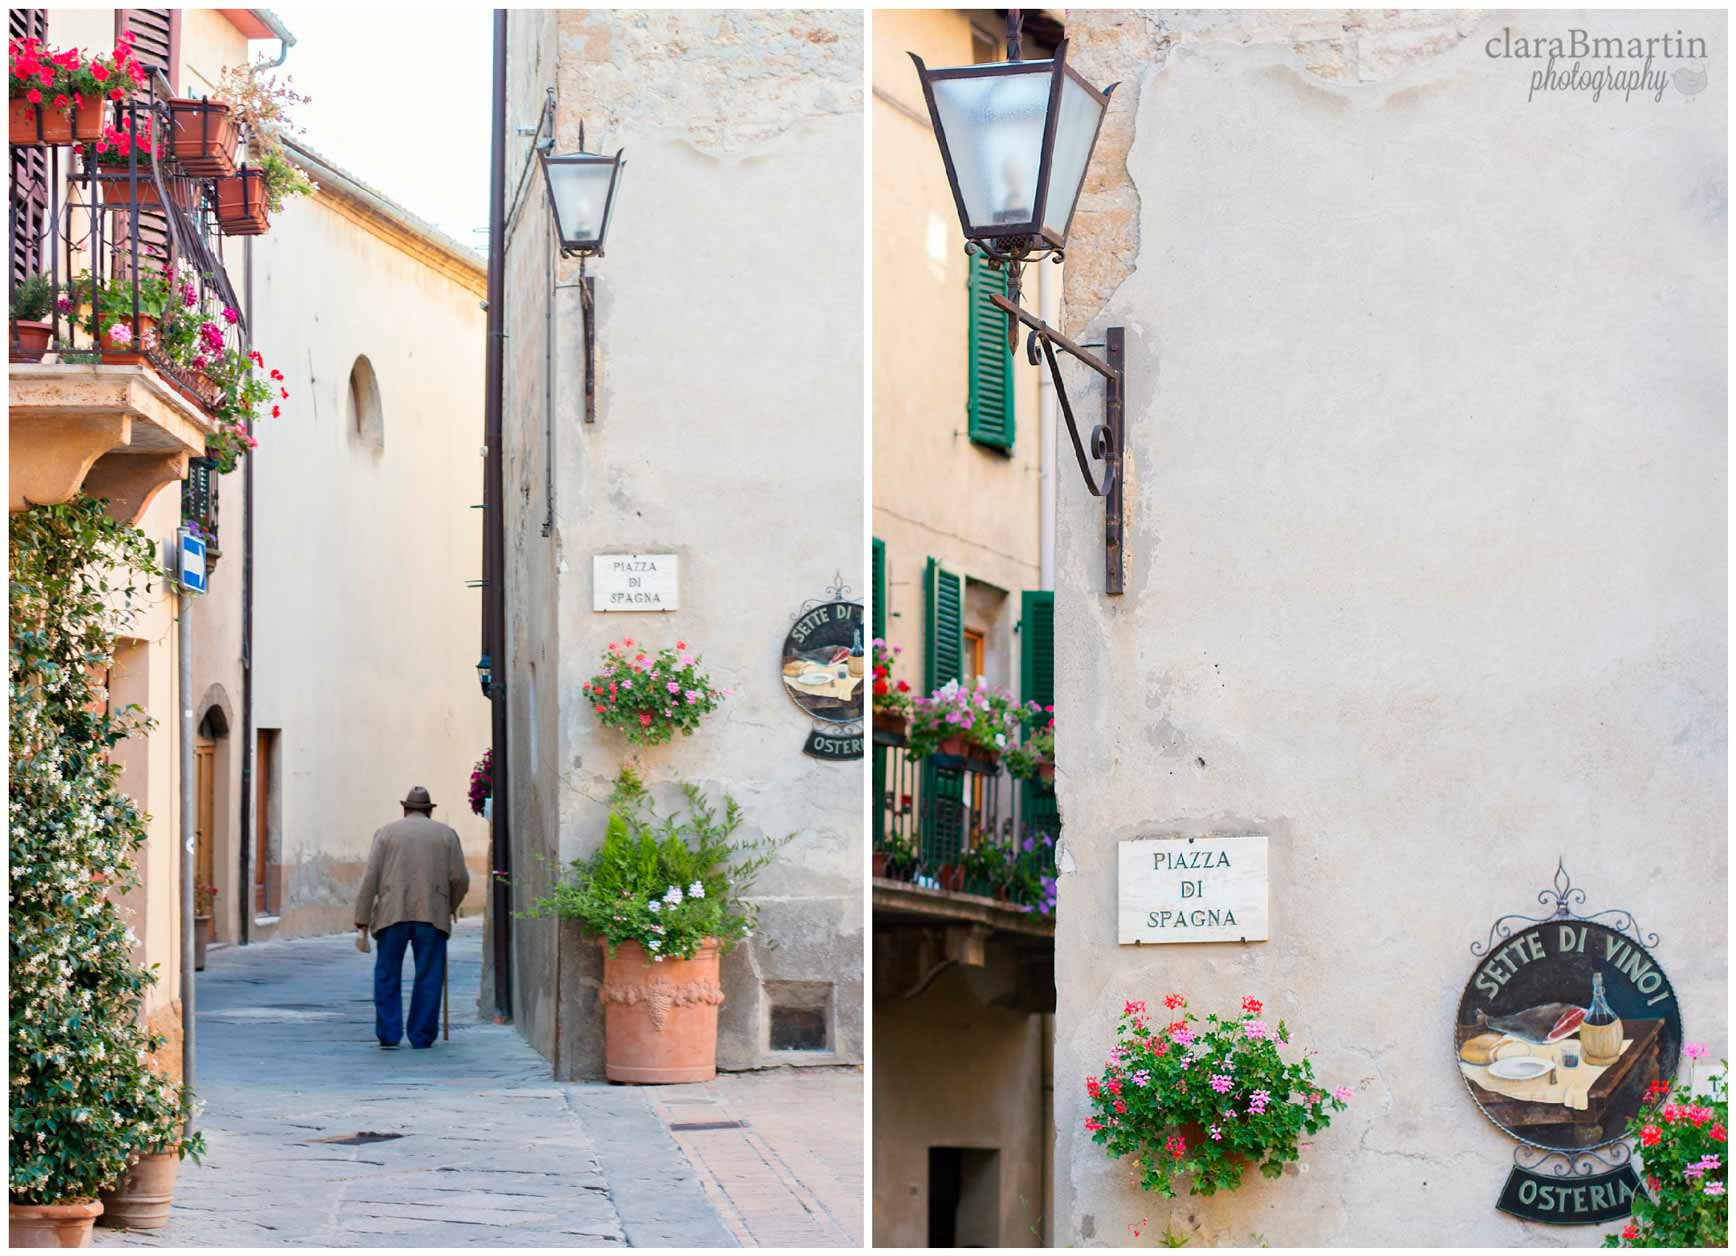 Tuscany_claraBmartin3Collage